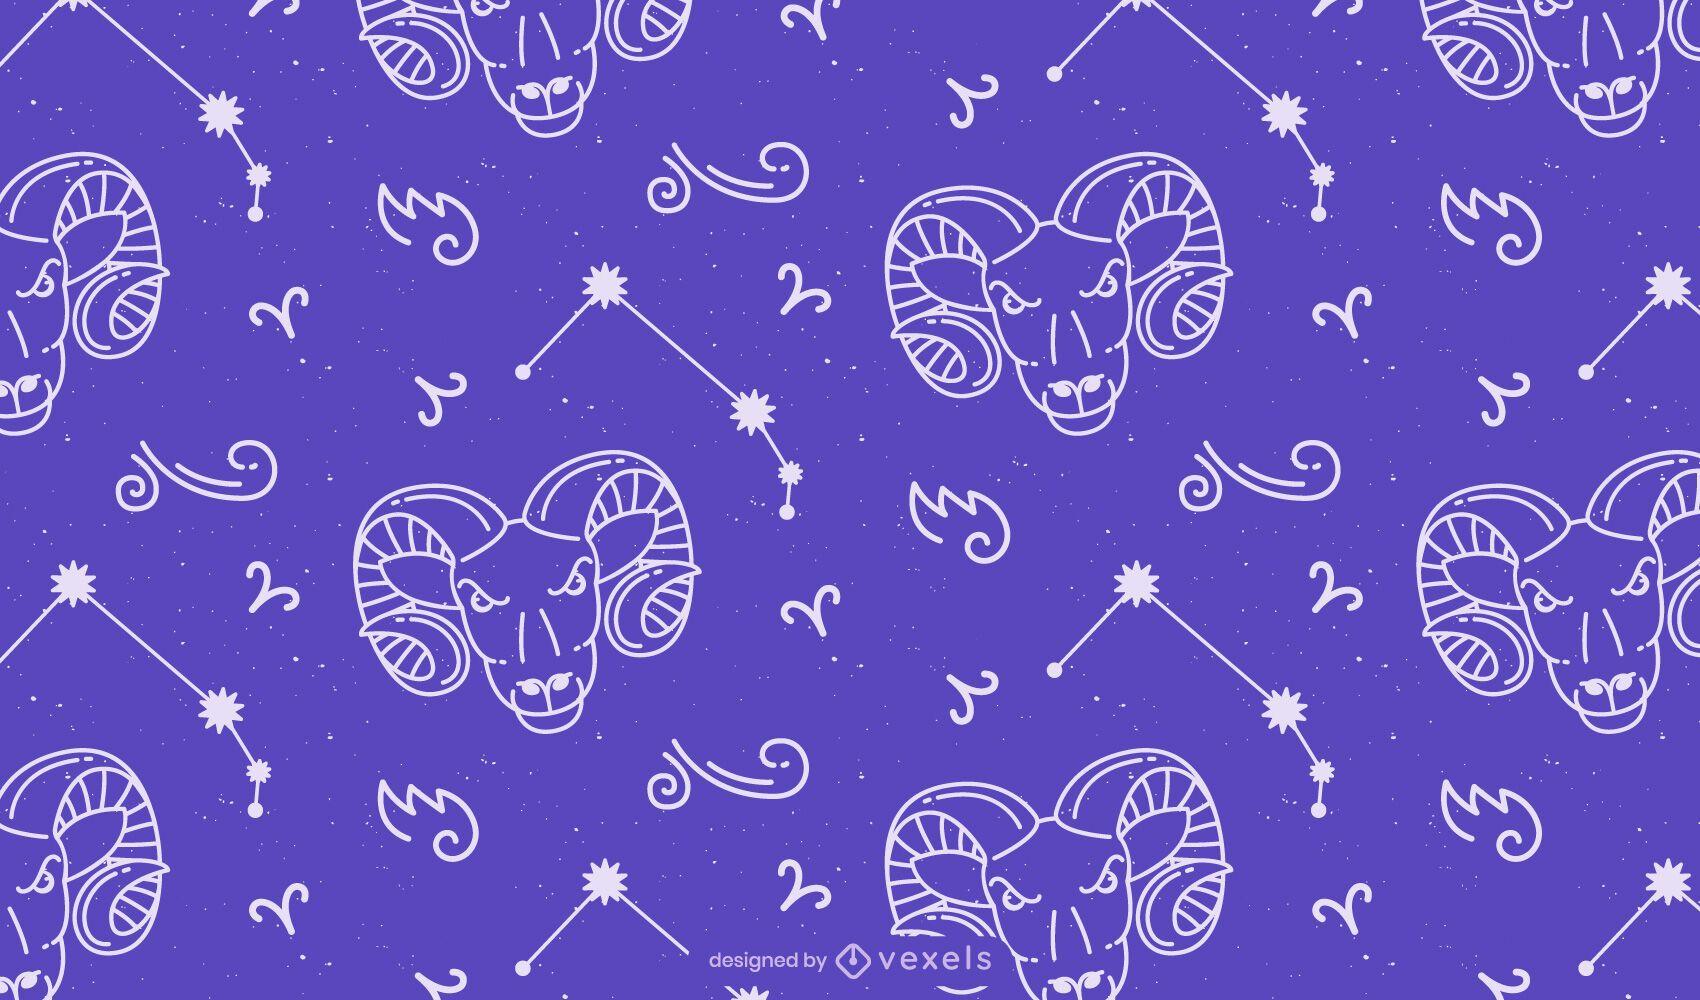 Aries sign horoscope pattern design